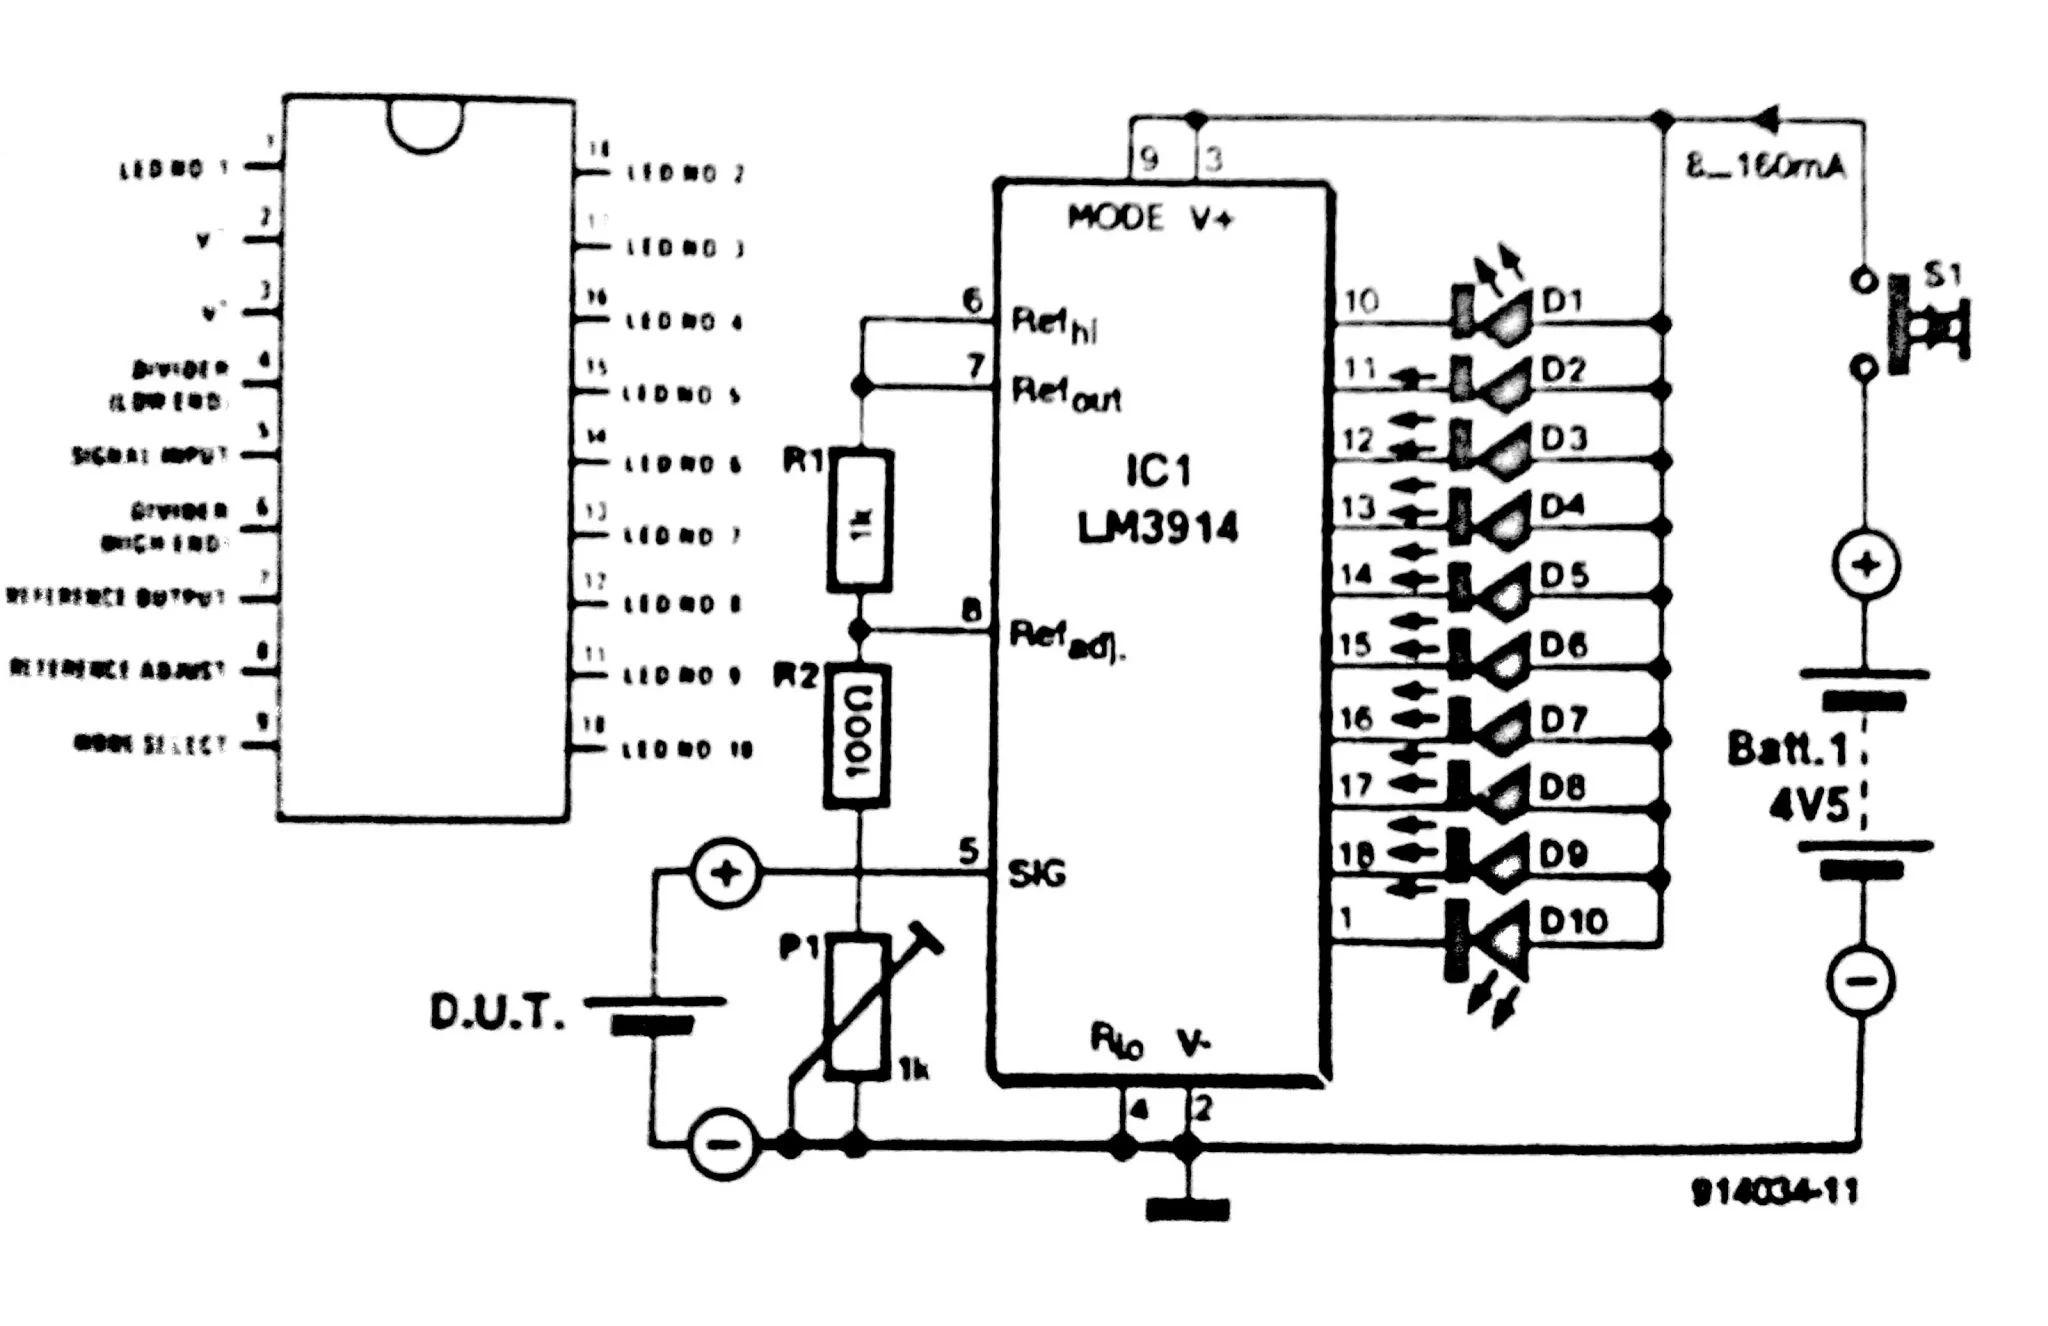 Xkcd Electrical Diagram - Auto Electrical Wiring Diagram on google diagram, family diagram, internet diagram, iphone diagram, time diagram, youtube diagram, windows diagram, environment diagram, star wars diagram, fun diagram, funny diagram,